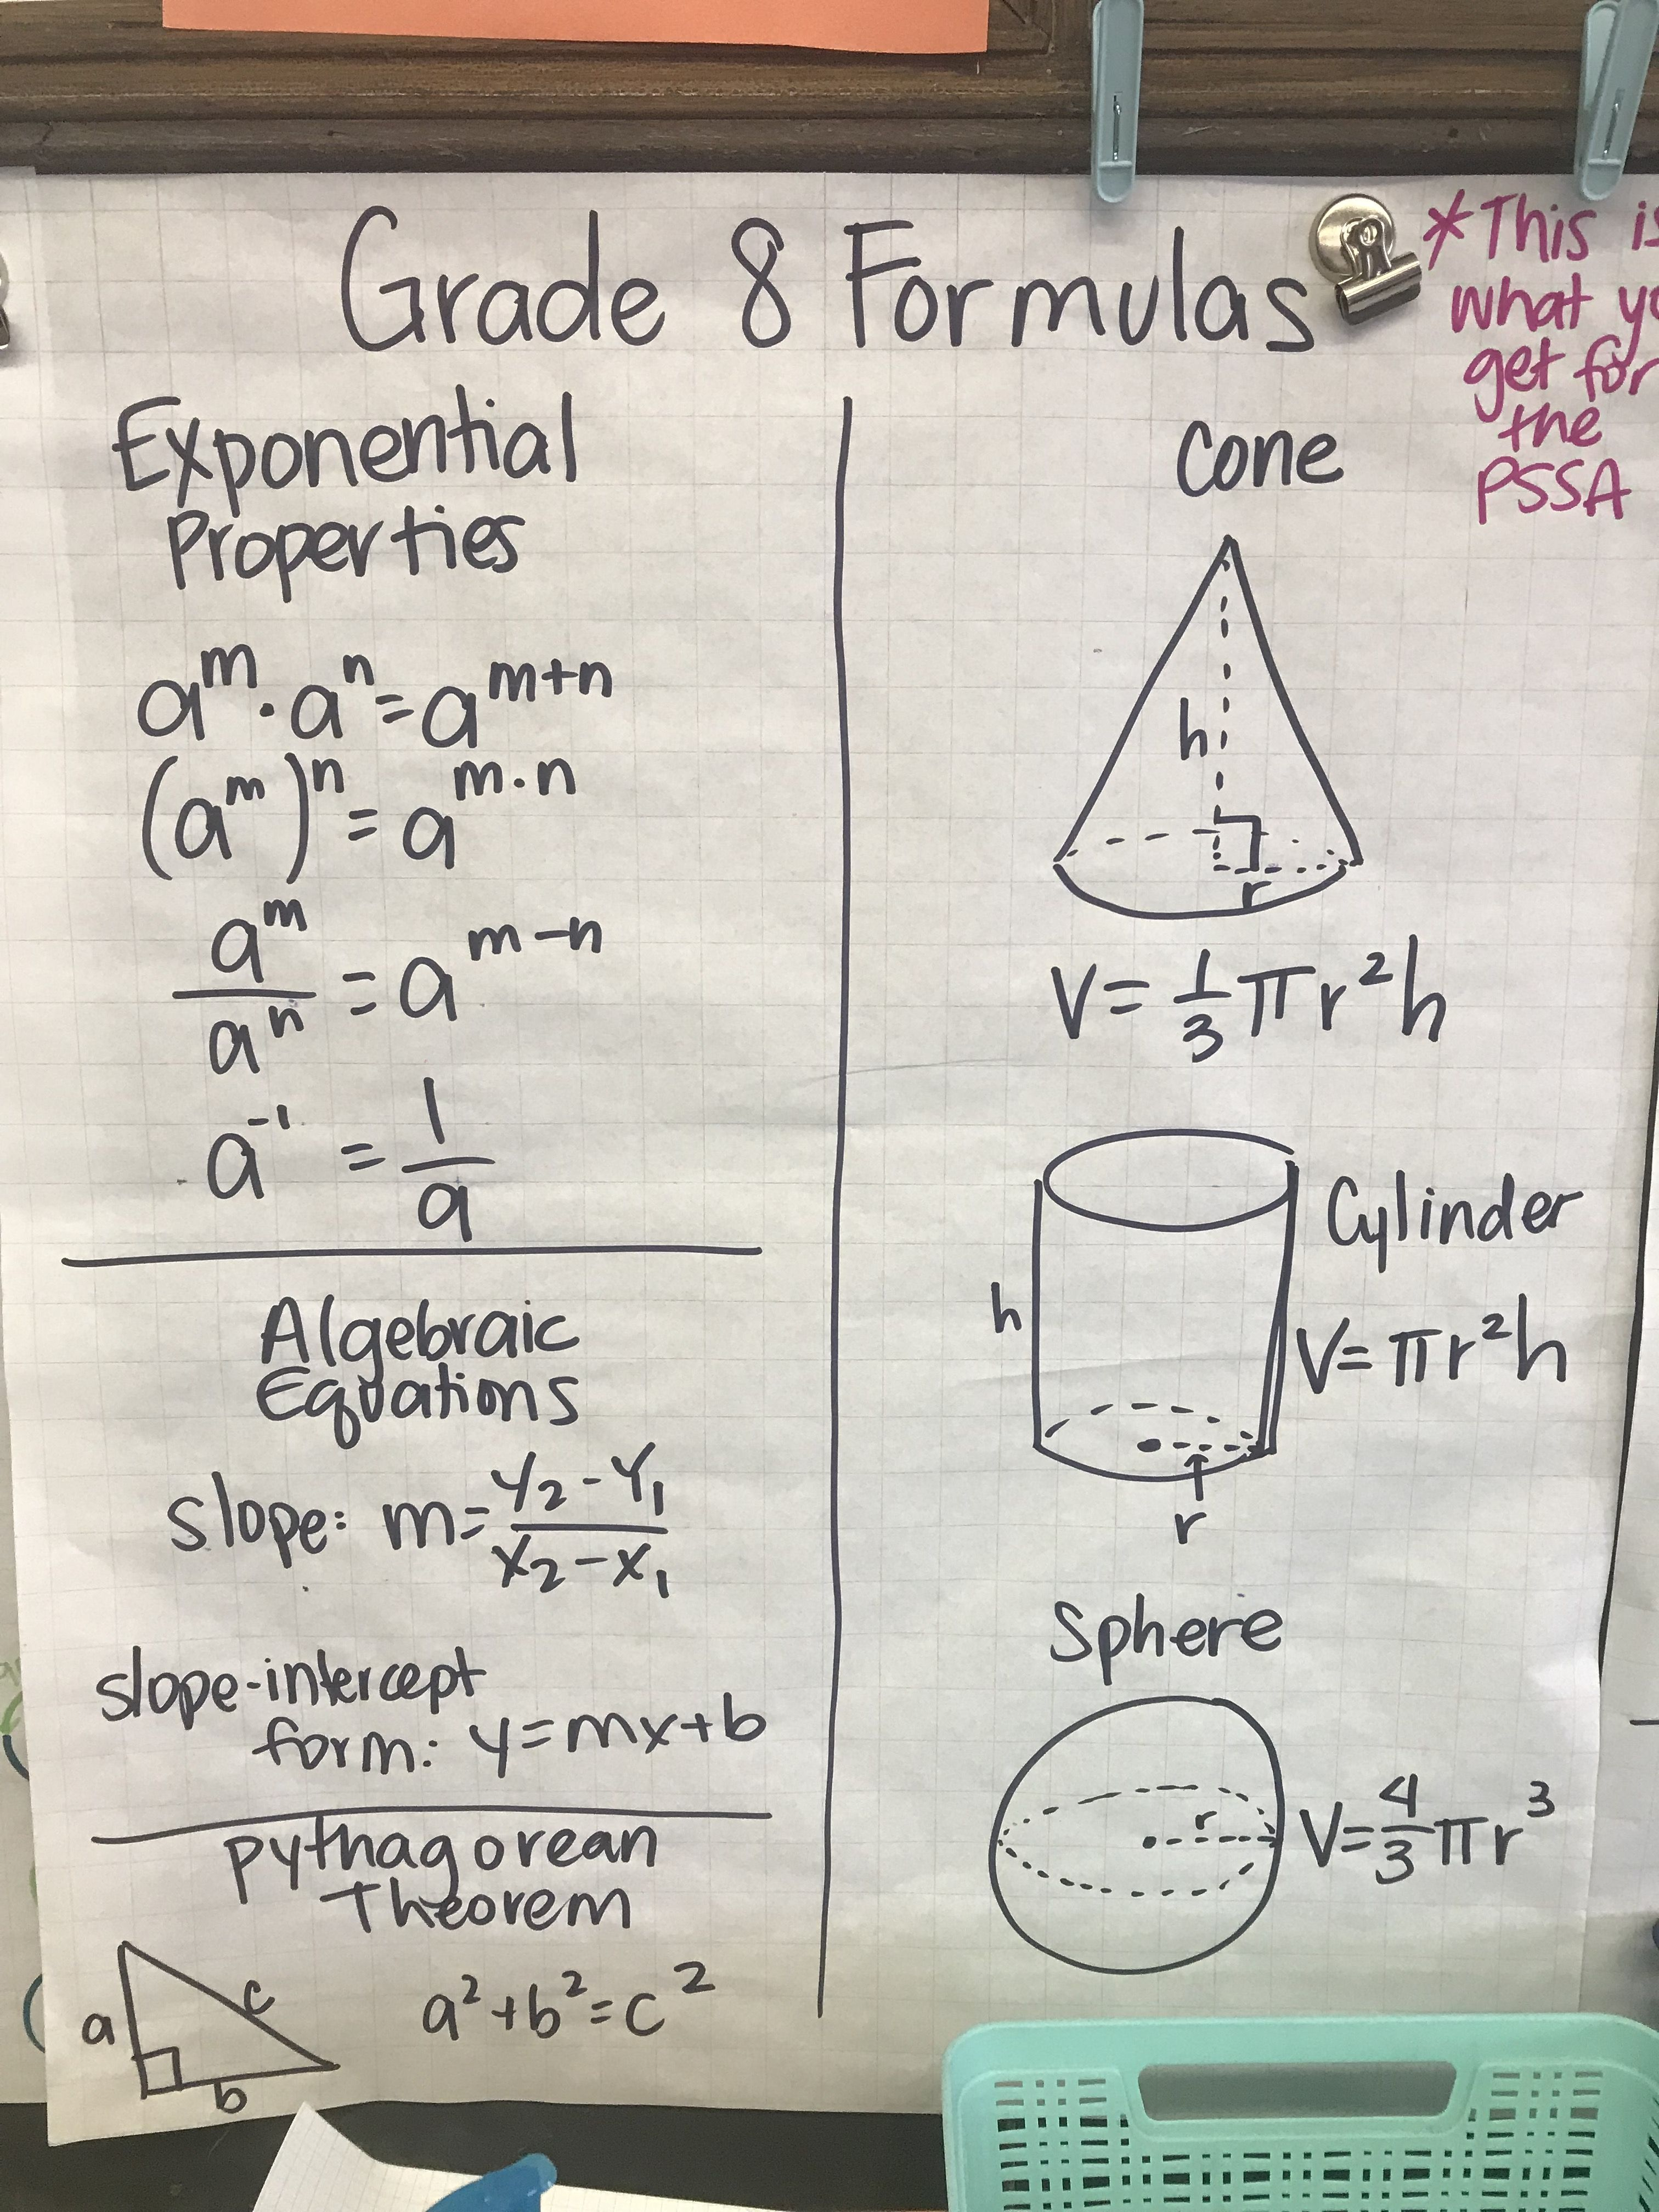 hight resolution of PSSA 8th Grade Formula Sheet anchor chart (photo only)   8th grade math